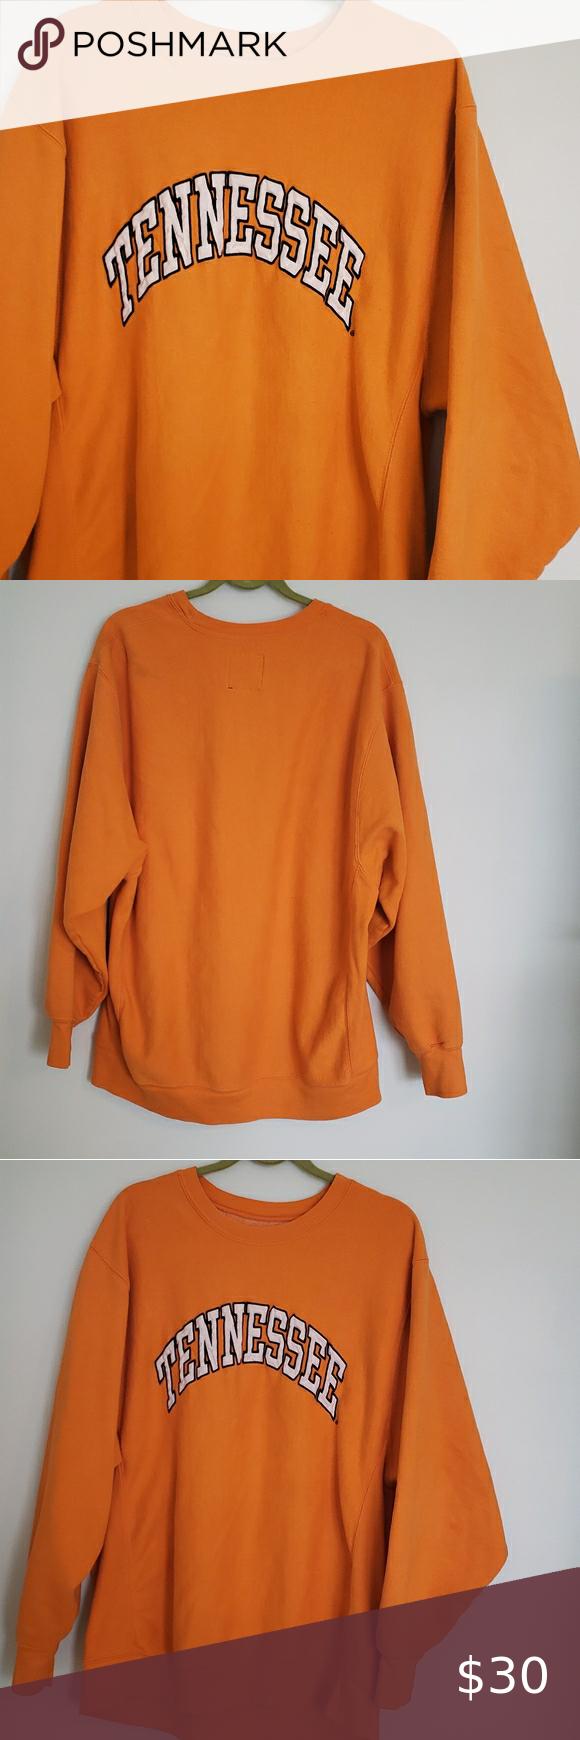 Vtg Oversized Tennessee Vols Crewneck Sweatshirt Sweatshirts Simple Fall Outfits Crew Neck Sweatshirt [ 1740 x 580 Pixel ]